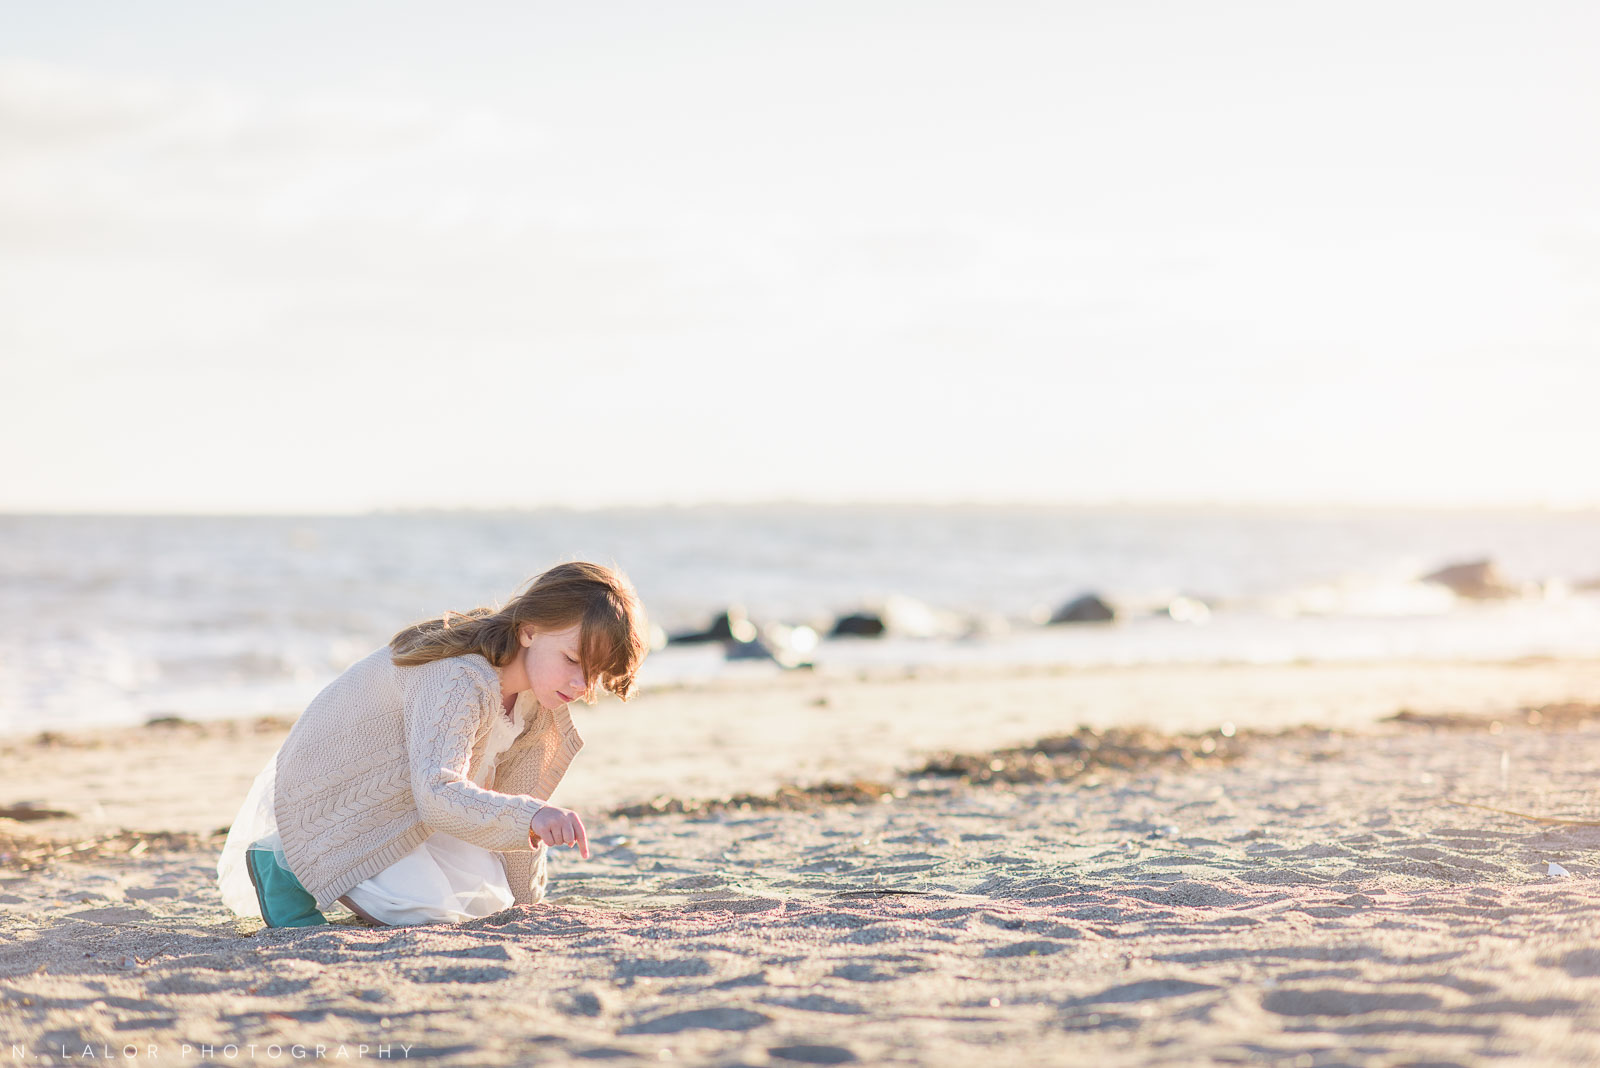 nlalor-photography-2015-10-04-gwen-beach-session-1.jpg